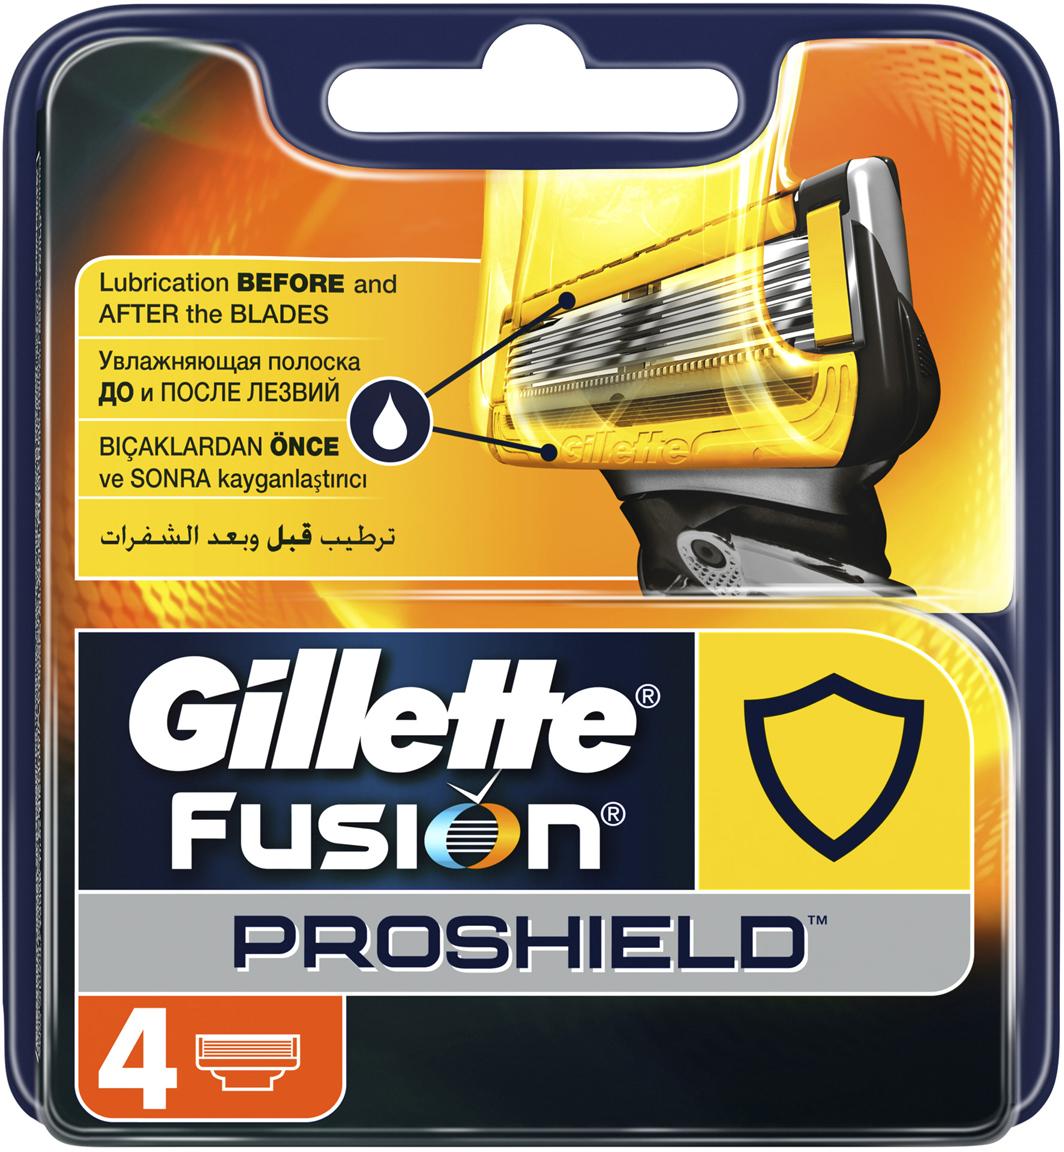 Gillette Сменные кассеты для мужской бритвы Fusion ProShield, 4 шт